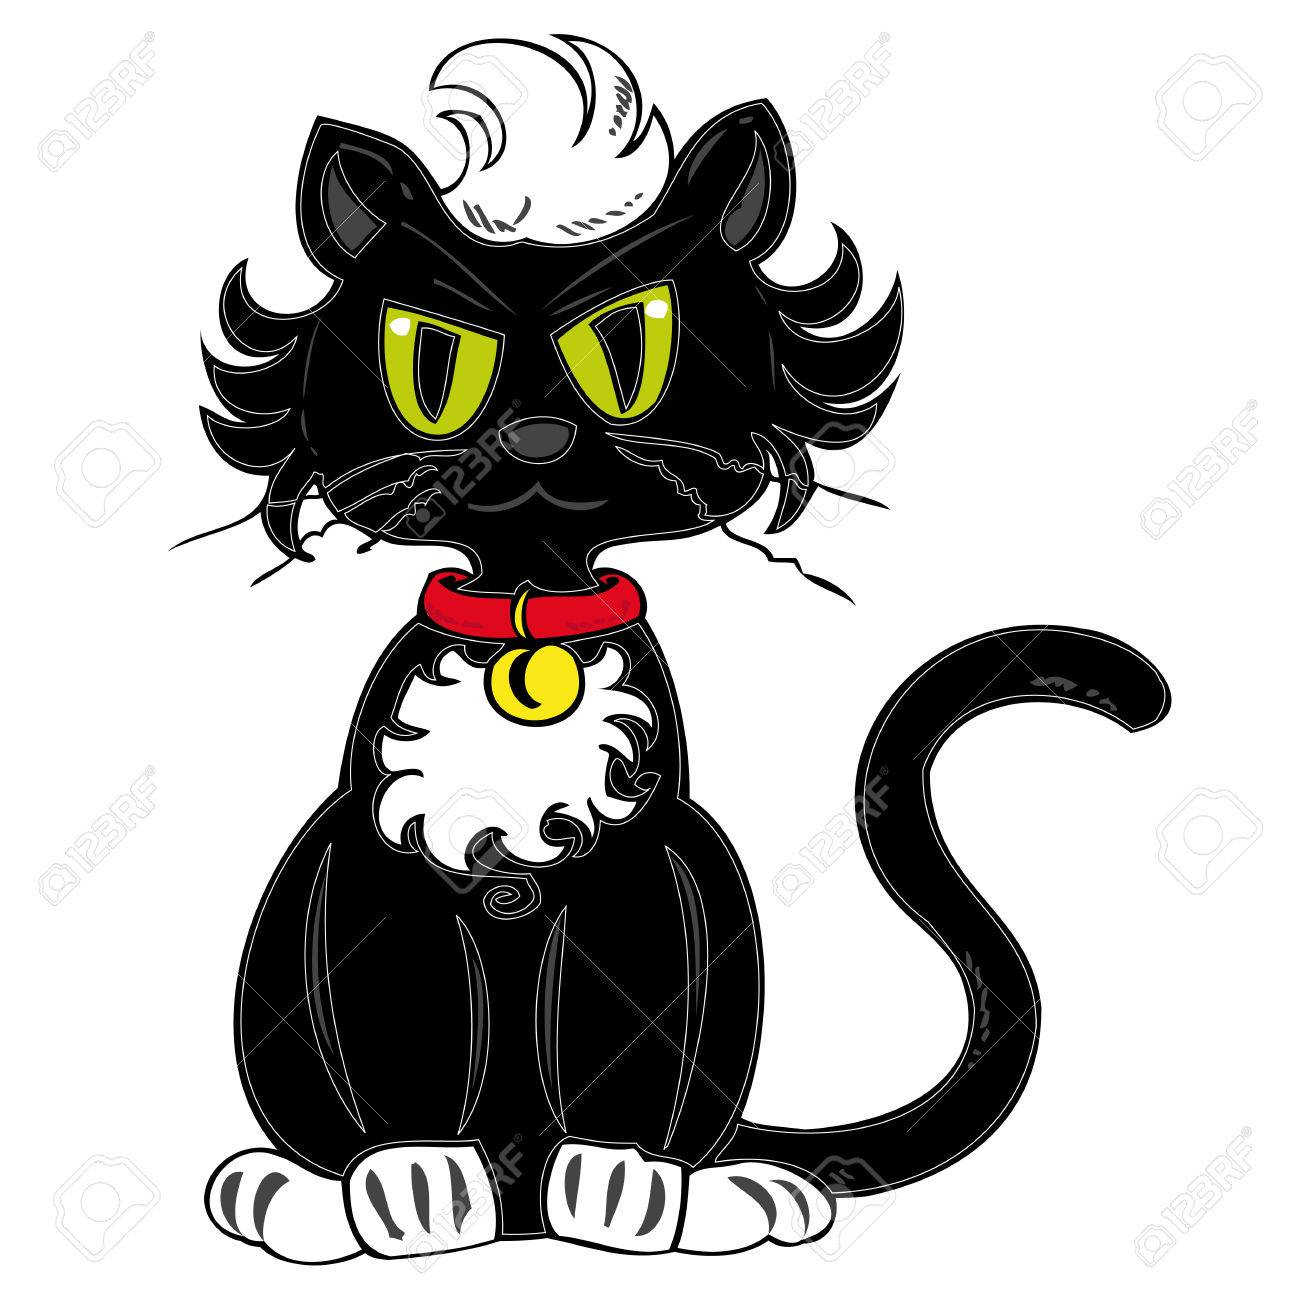 Black cat. Stock Vector - 7973685